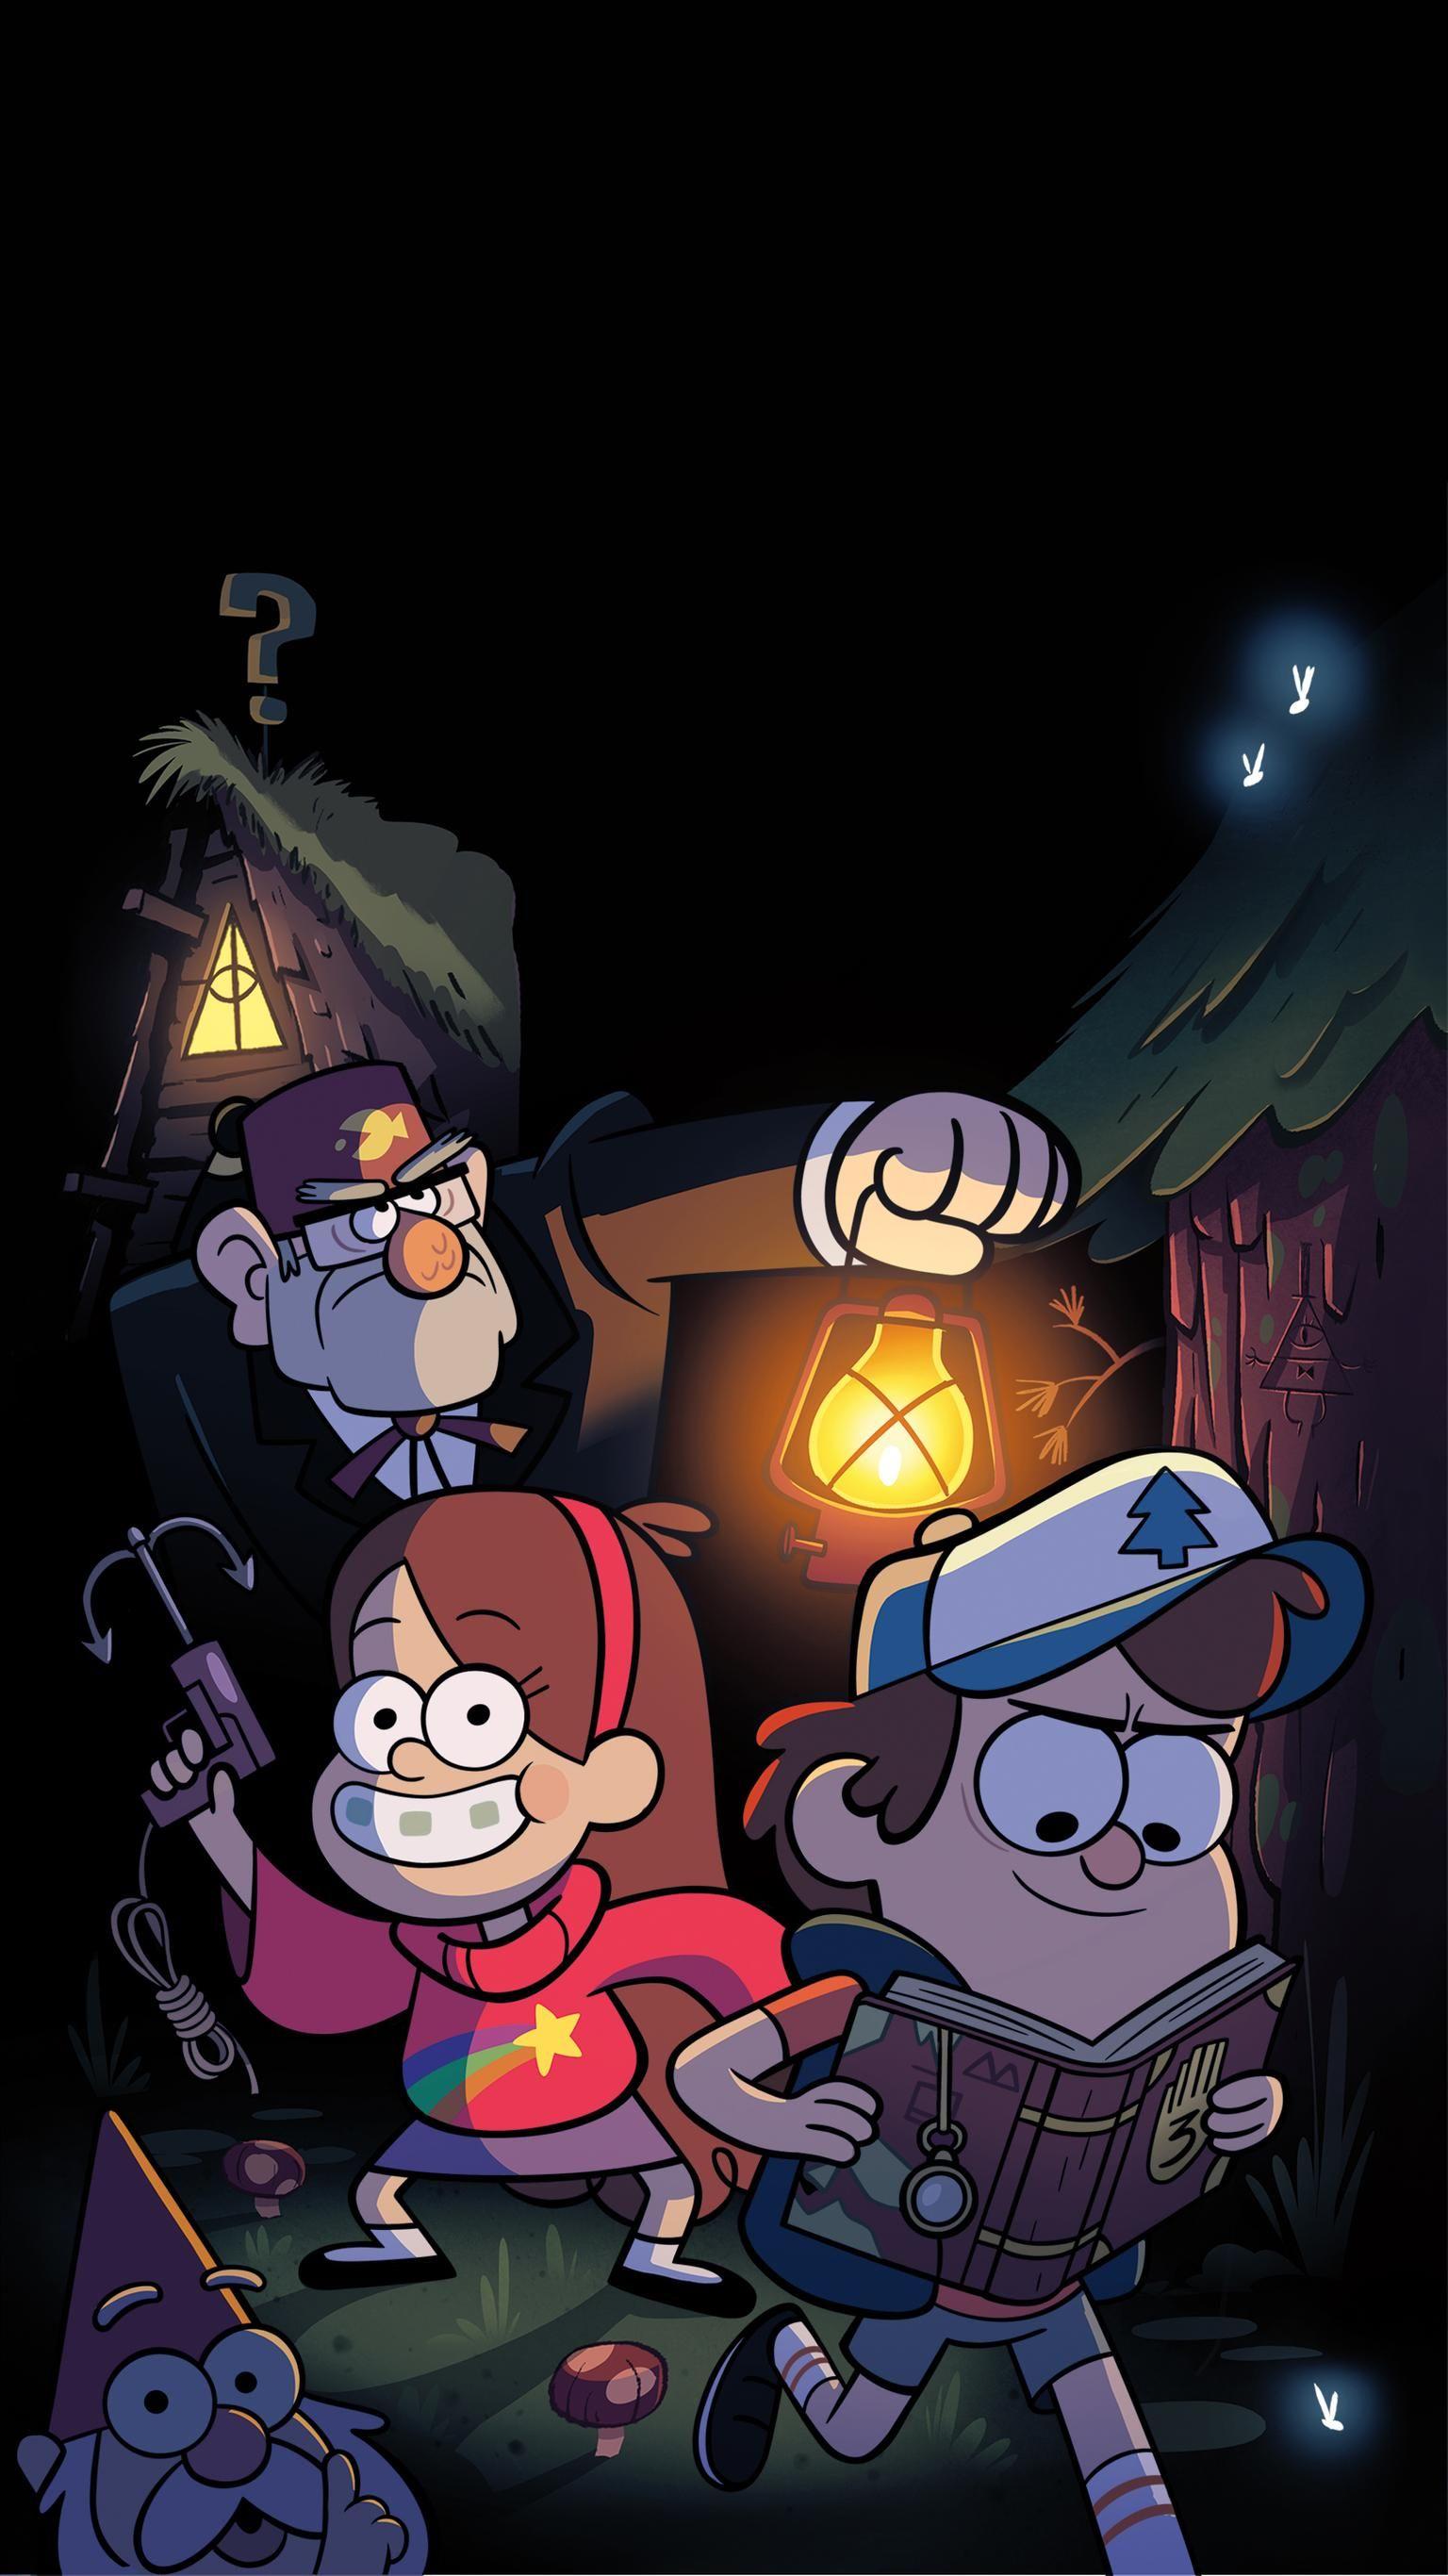 Gravity Falls Phone Wallpaper Гравити фолз, Мультфильмы